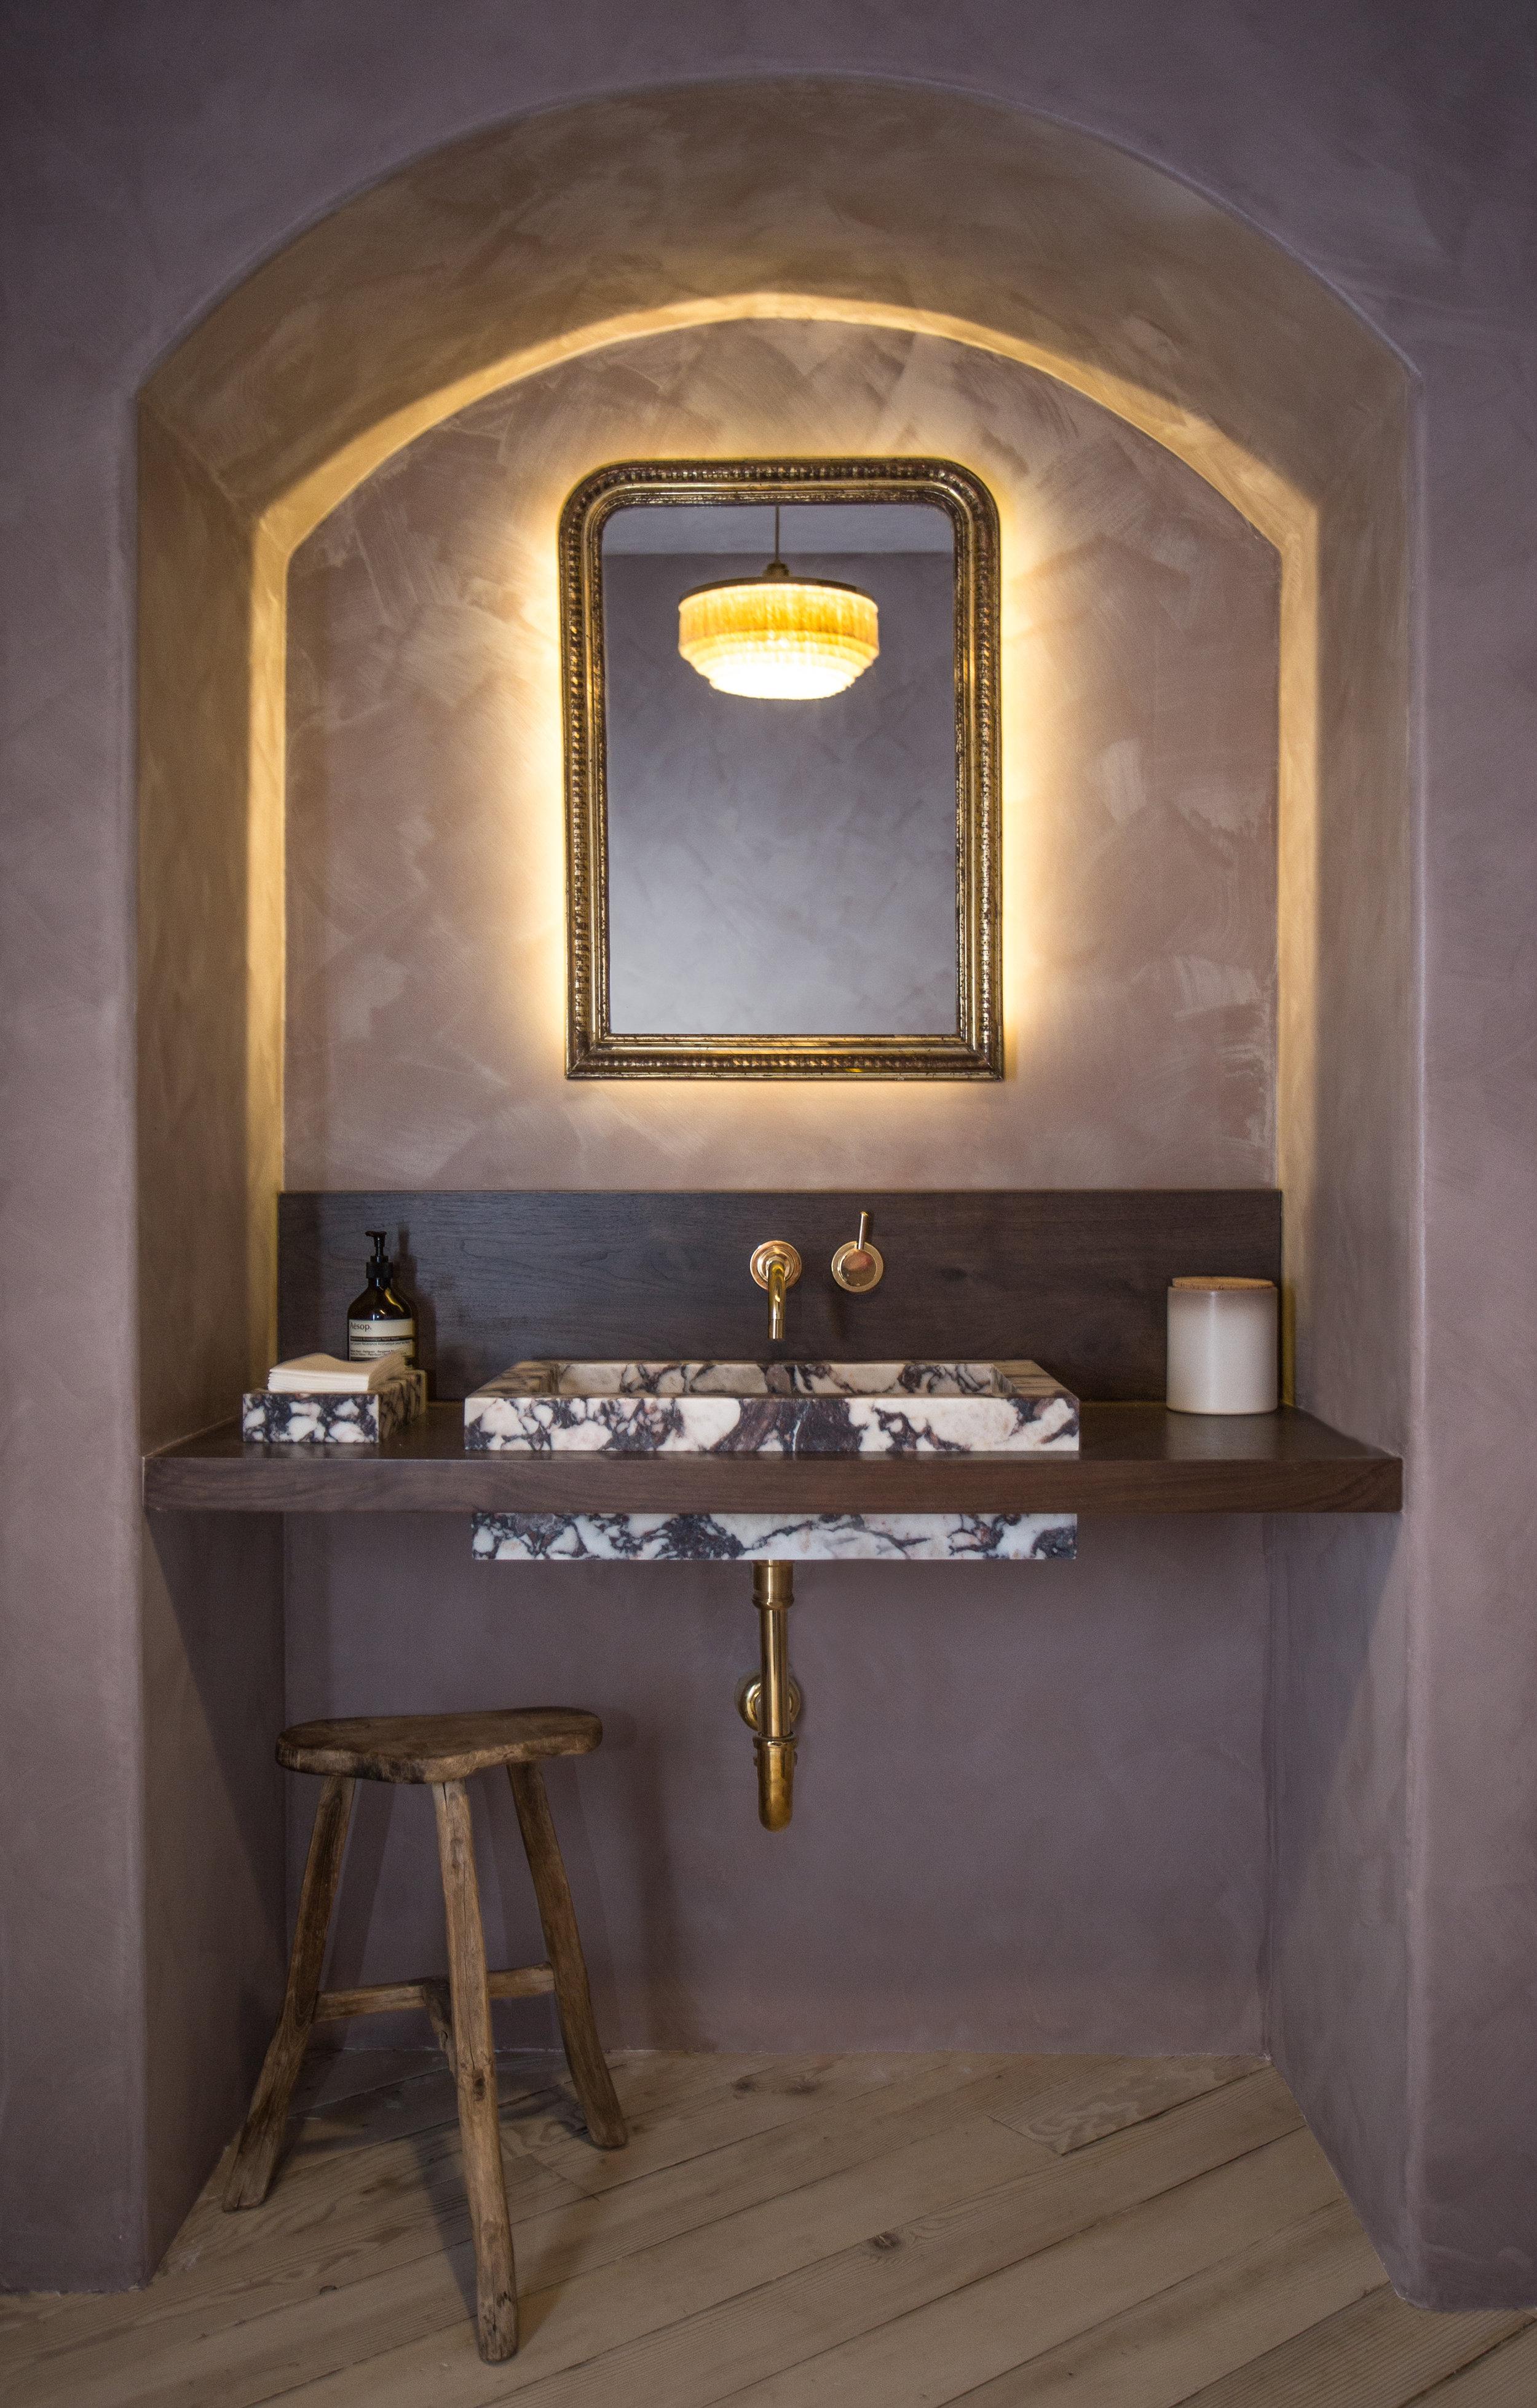 Shani Darden Studio - Spa Room Sink.jpg